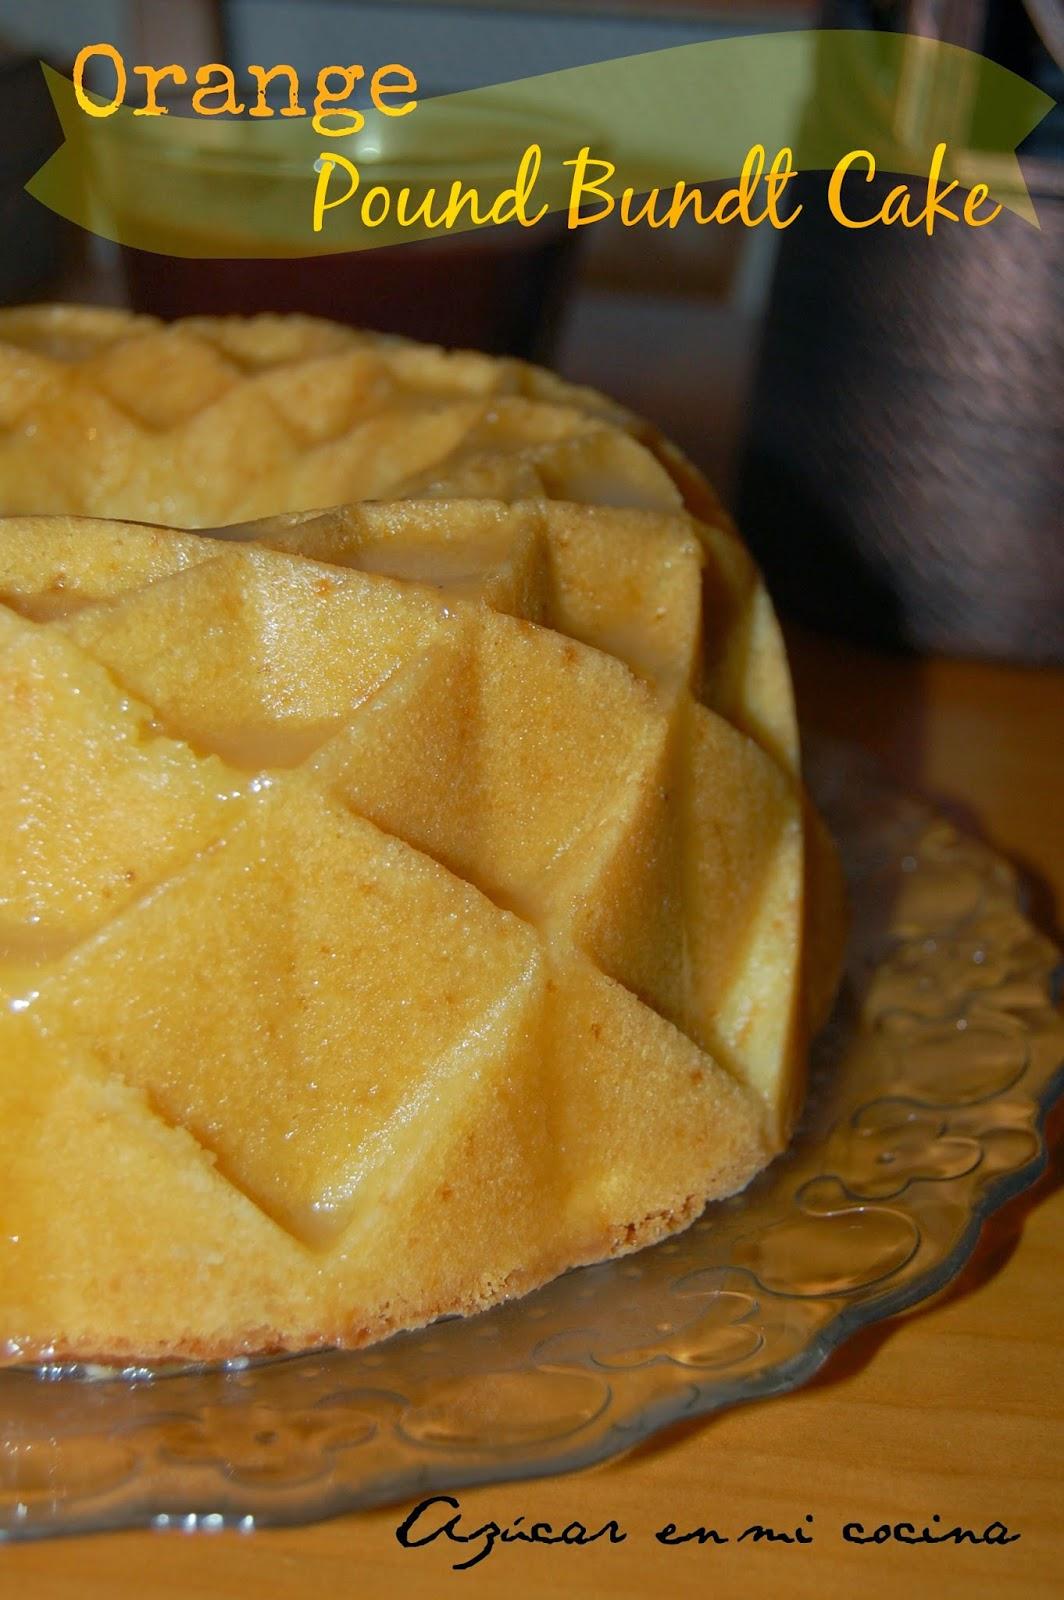 http://azucarenmicocina.blogspot.com.es/2015/01/orange-pound-bundt-cake.html